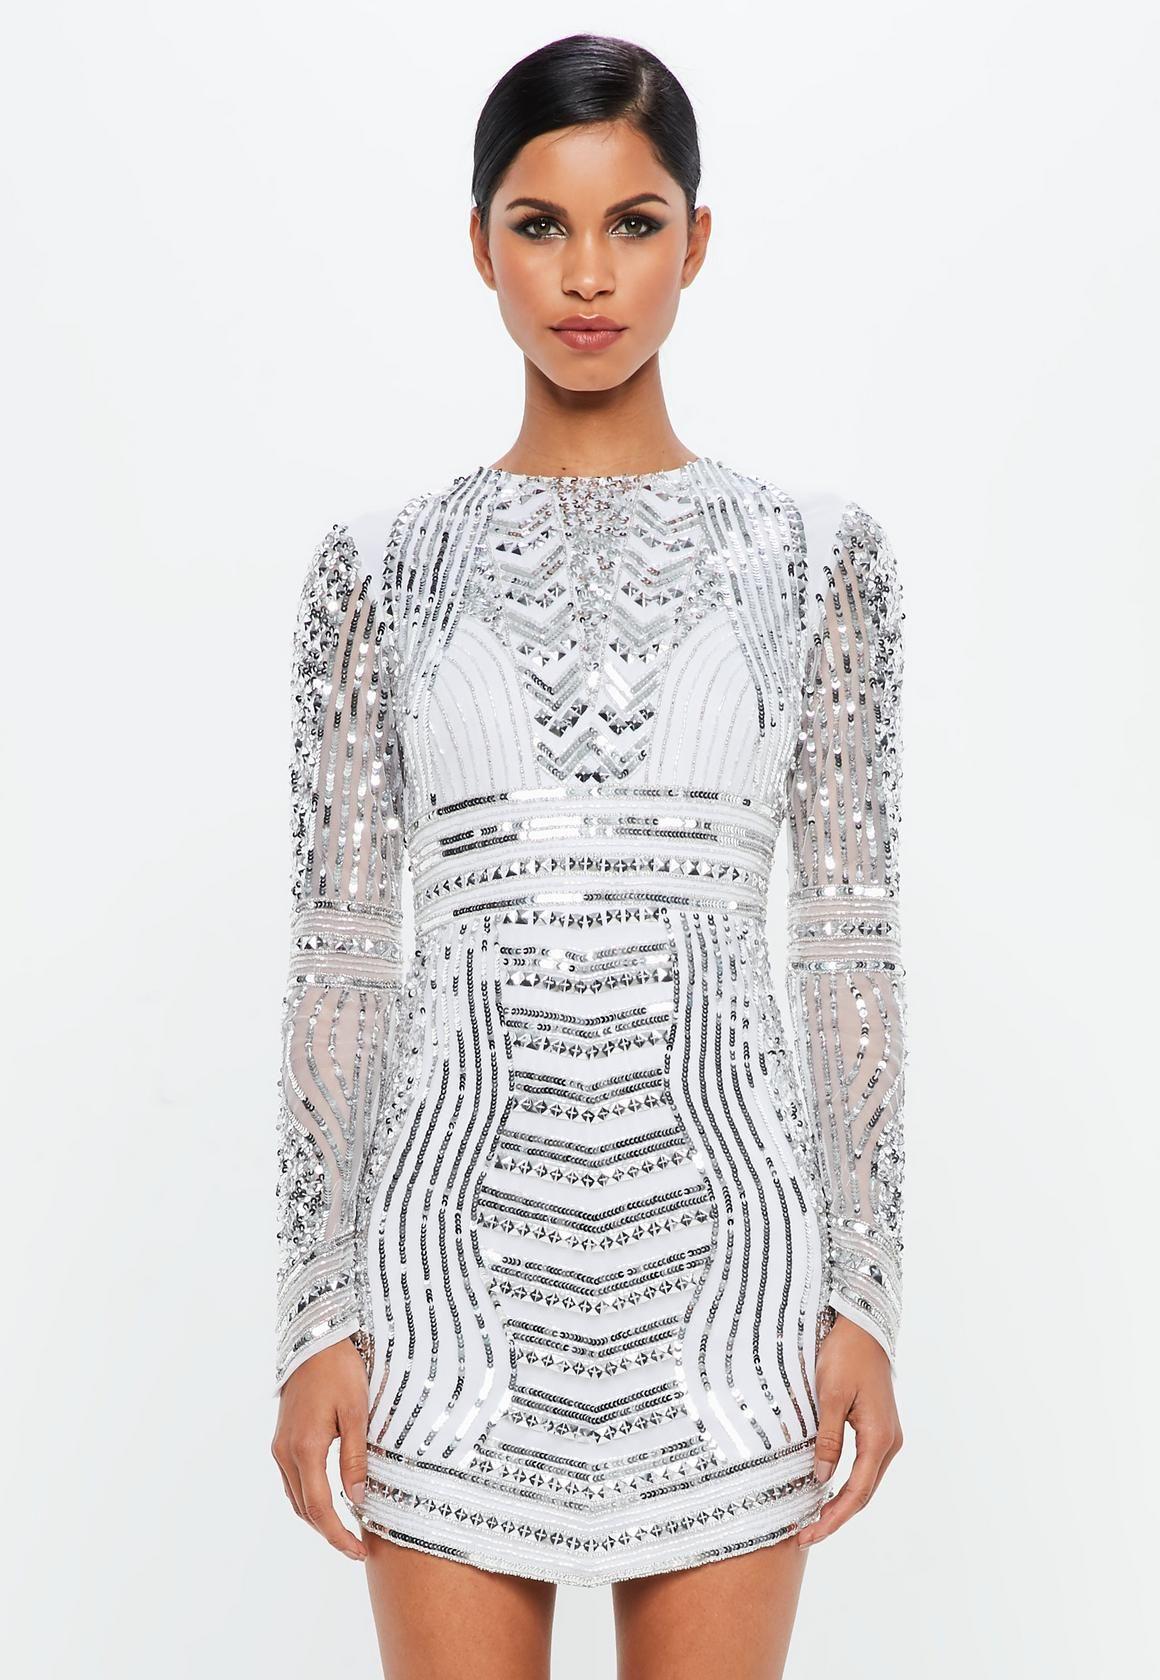 af2e176993 Missguided - Peace Love Silver Embellished Curve Hem Mini Dress ...